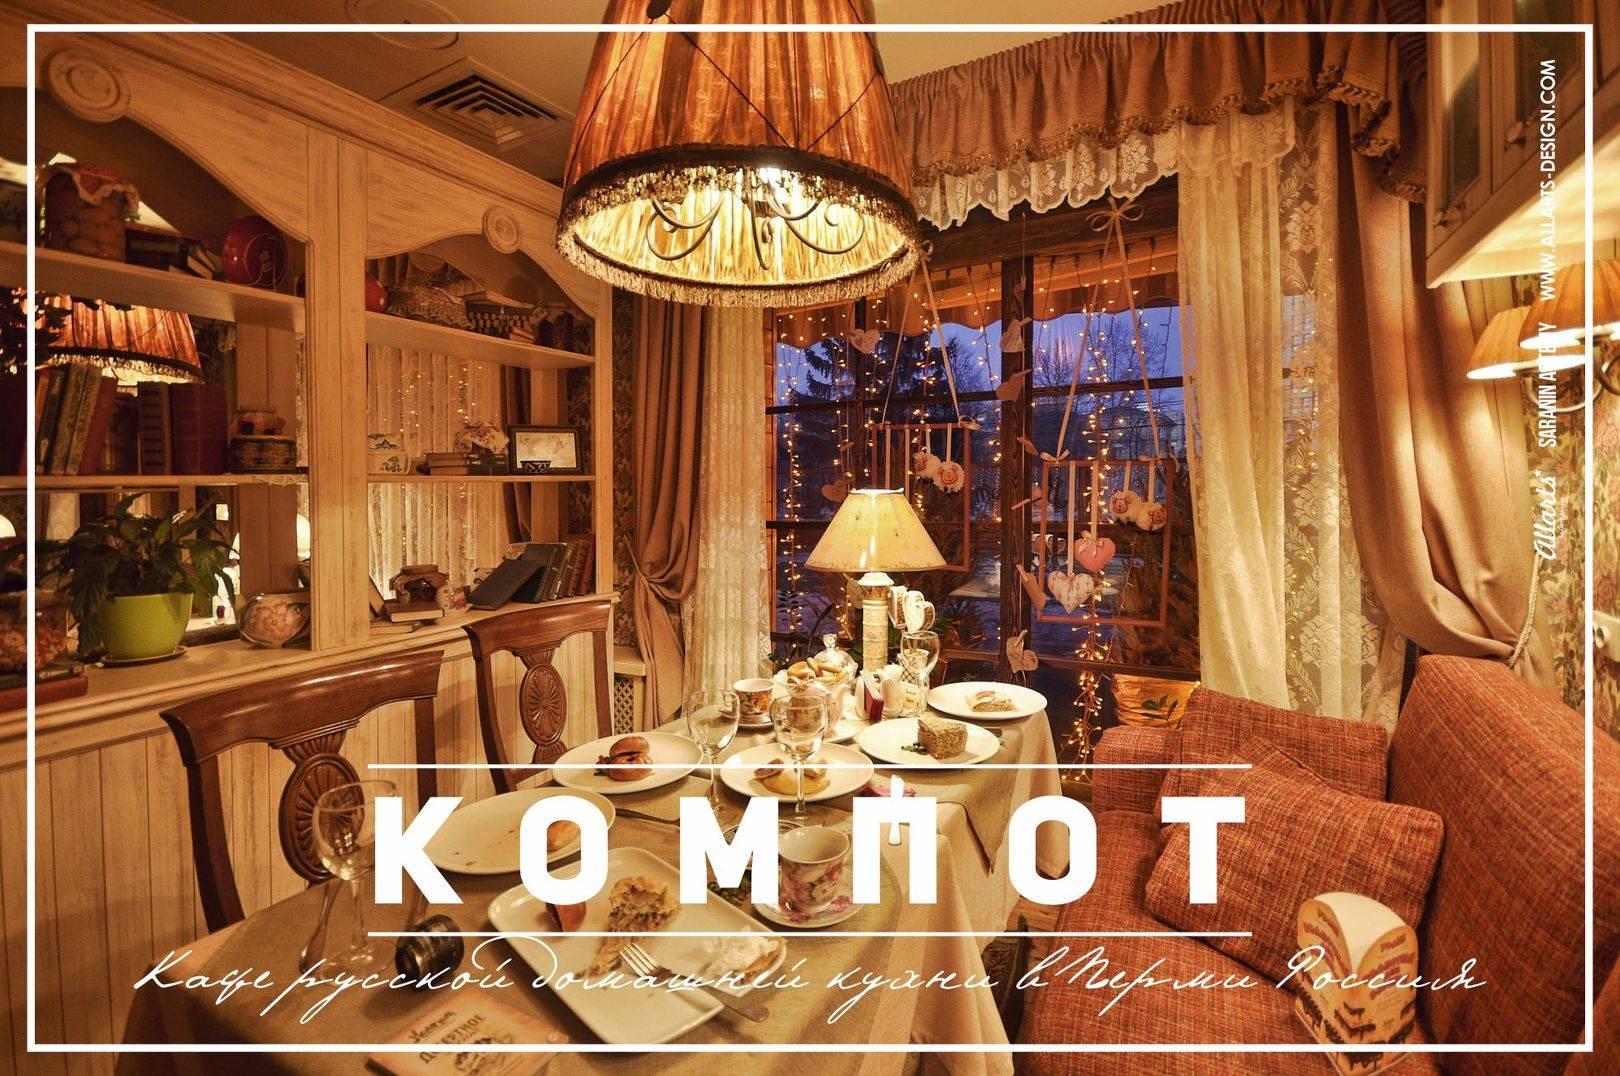 Дизайн интерьера кафе Компот